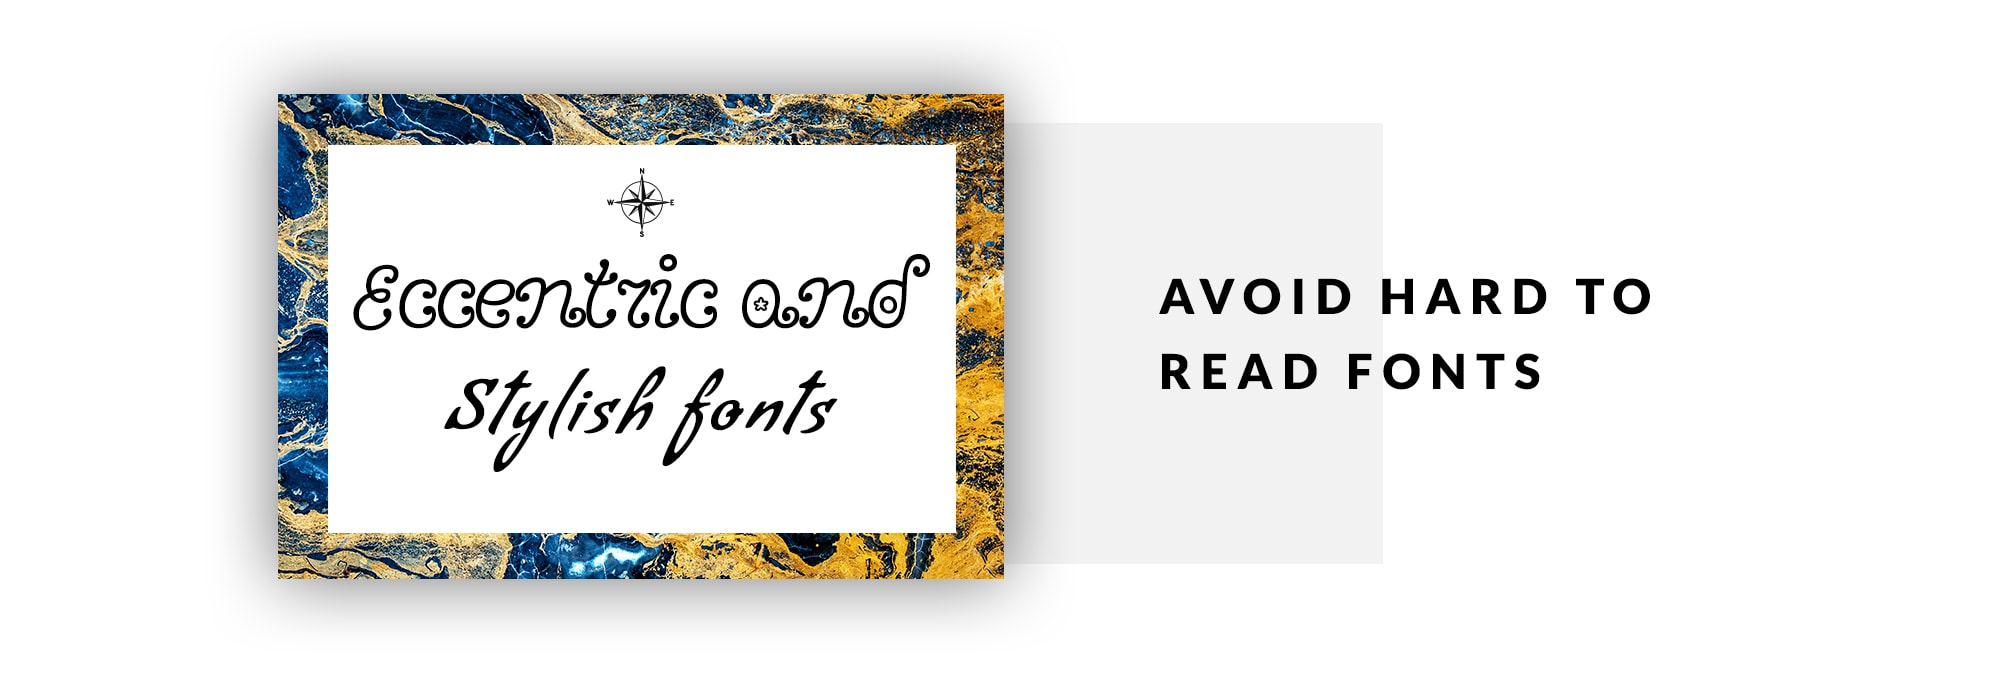 Avoid Hard to Read Fonts